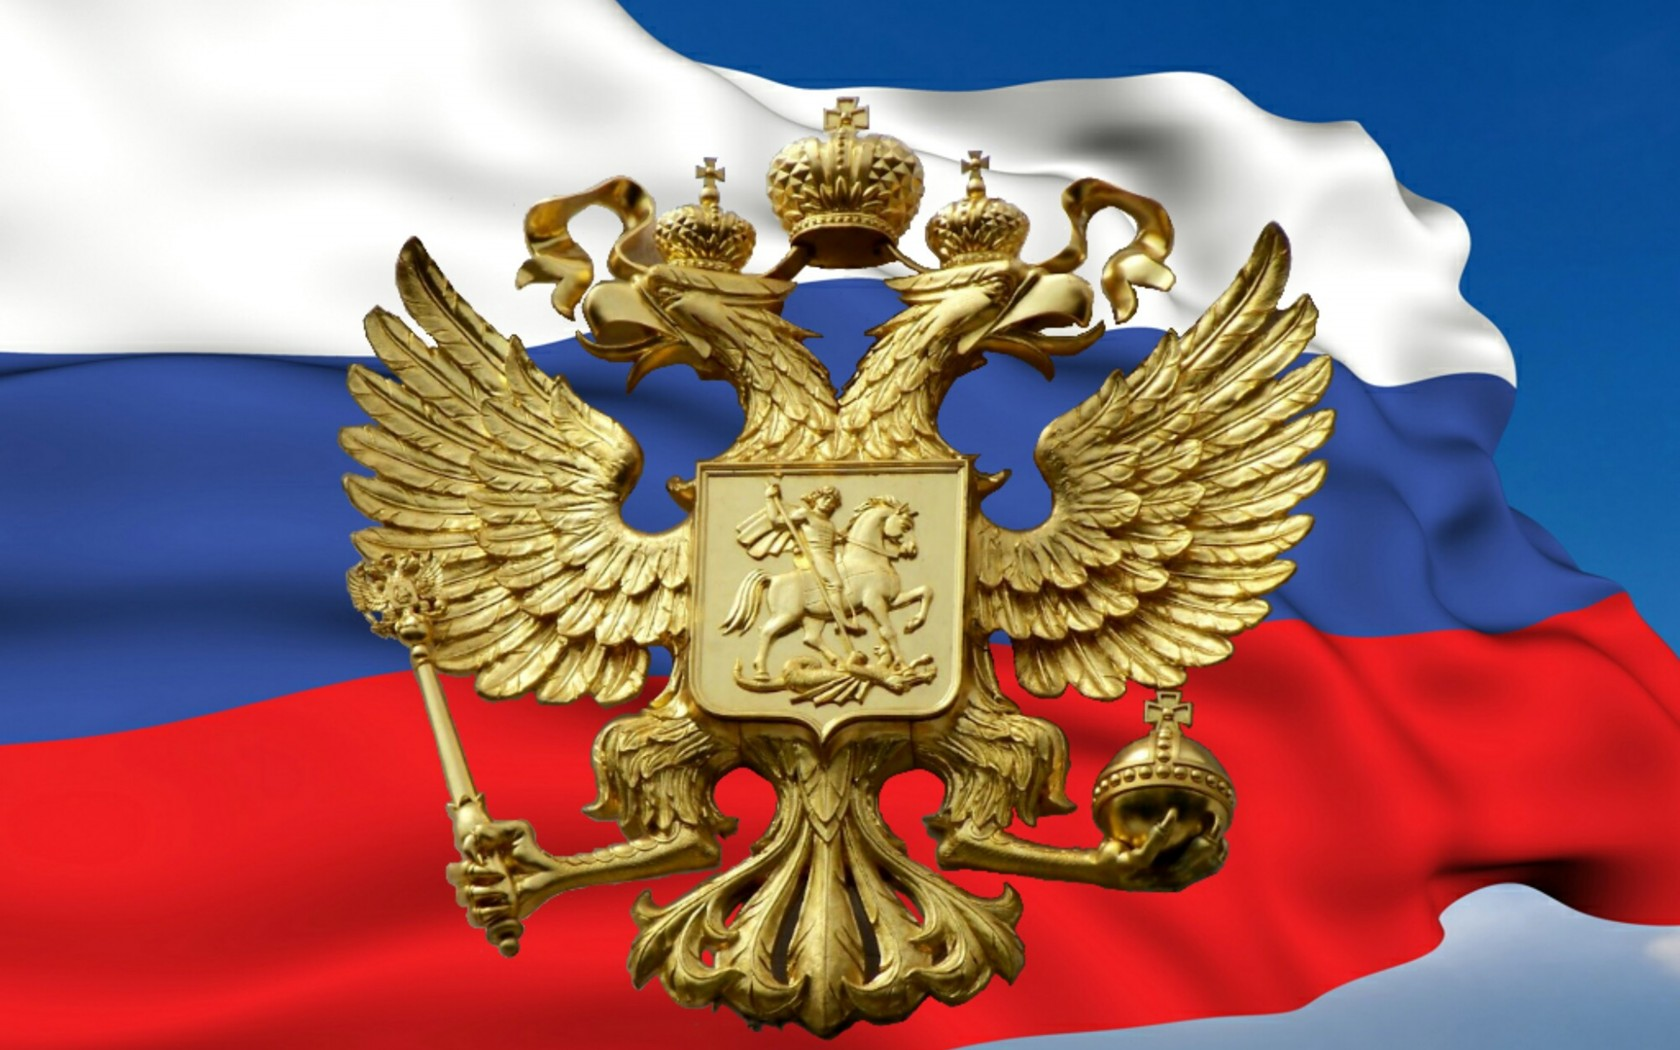 Картинка герба с флагом